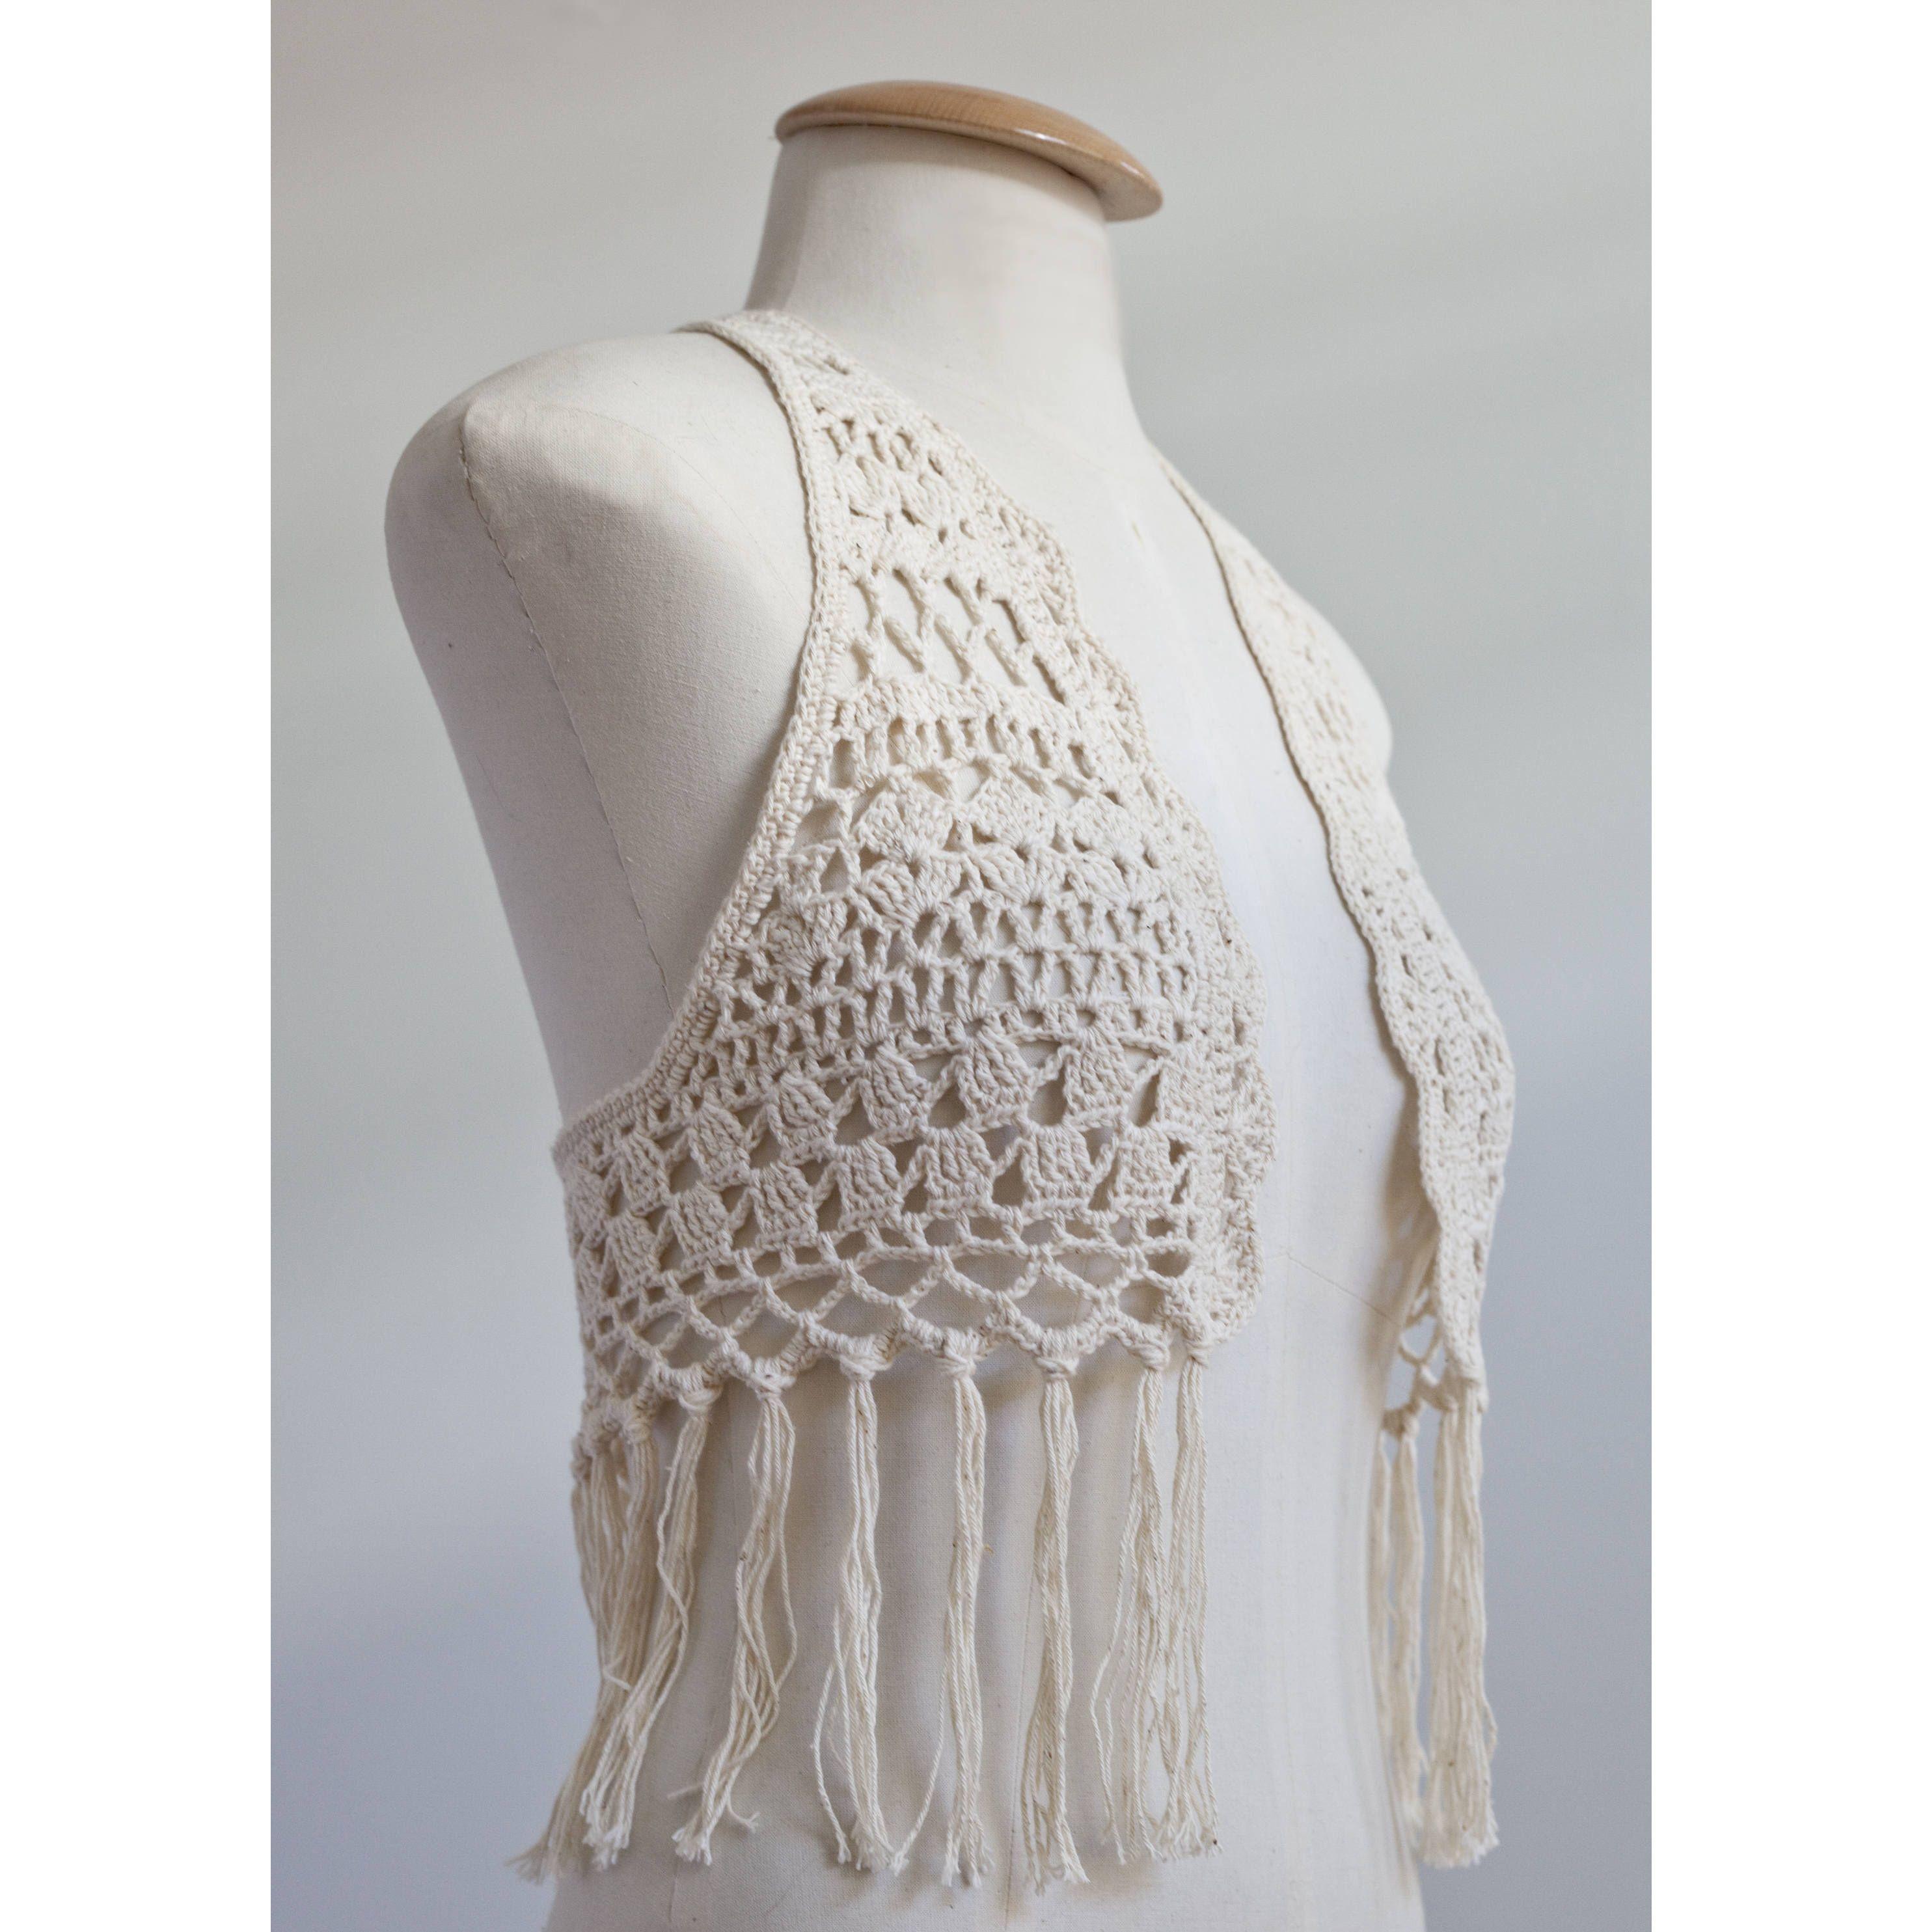 crochet top with fringes, crochet vest, boho, bohemian, gypsy, Ibiza ...